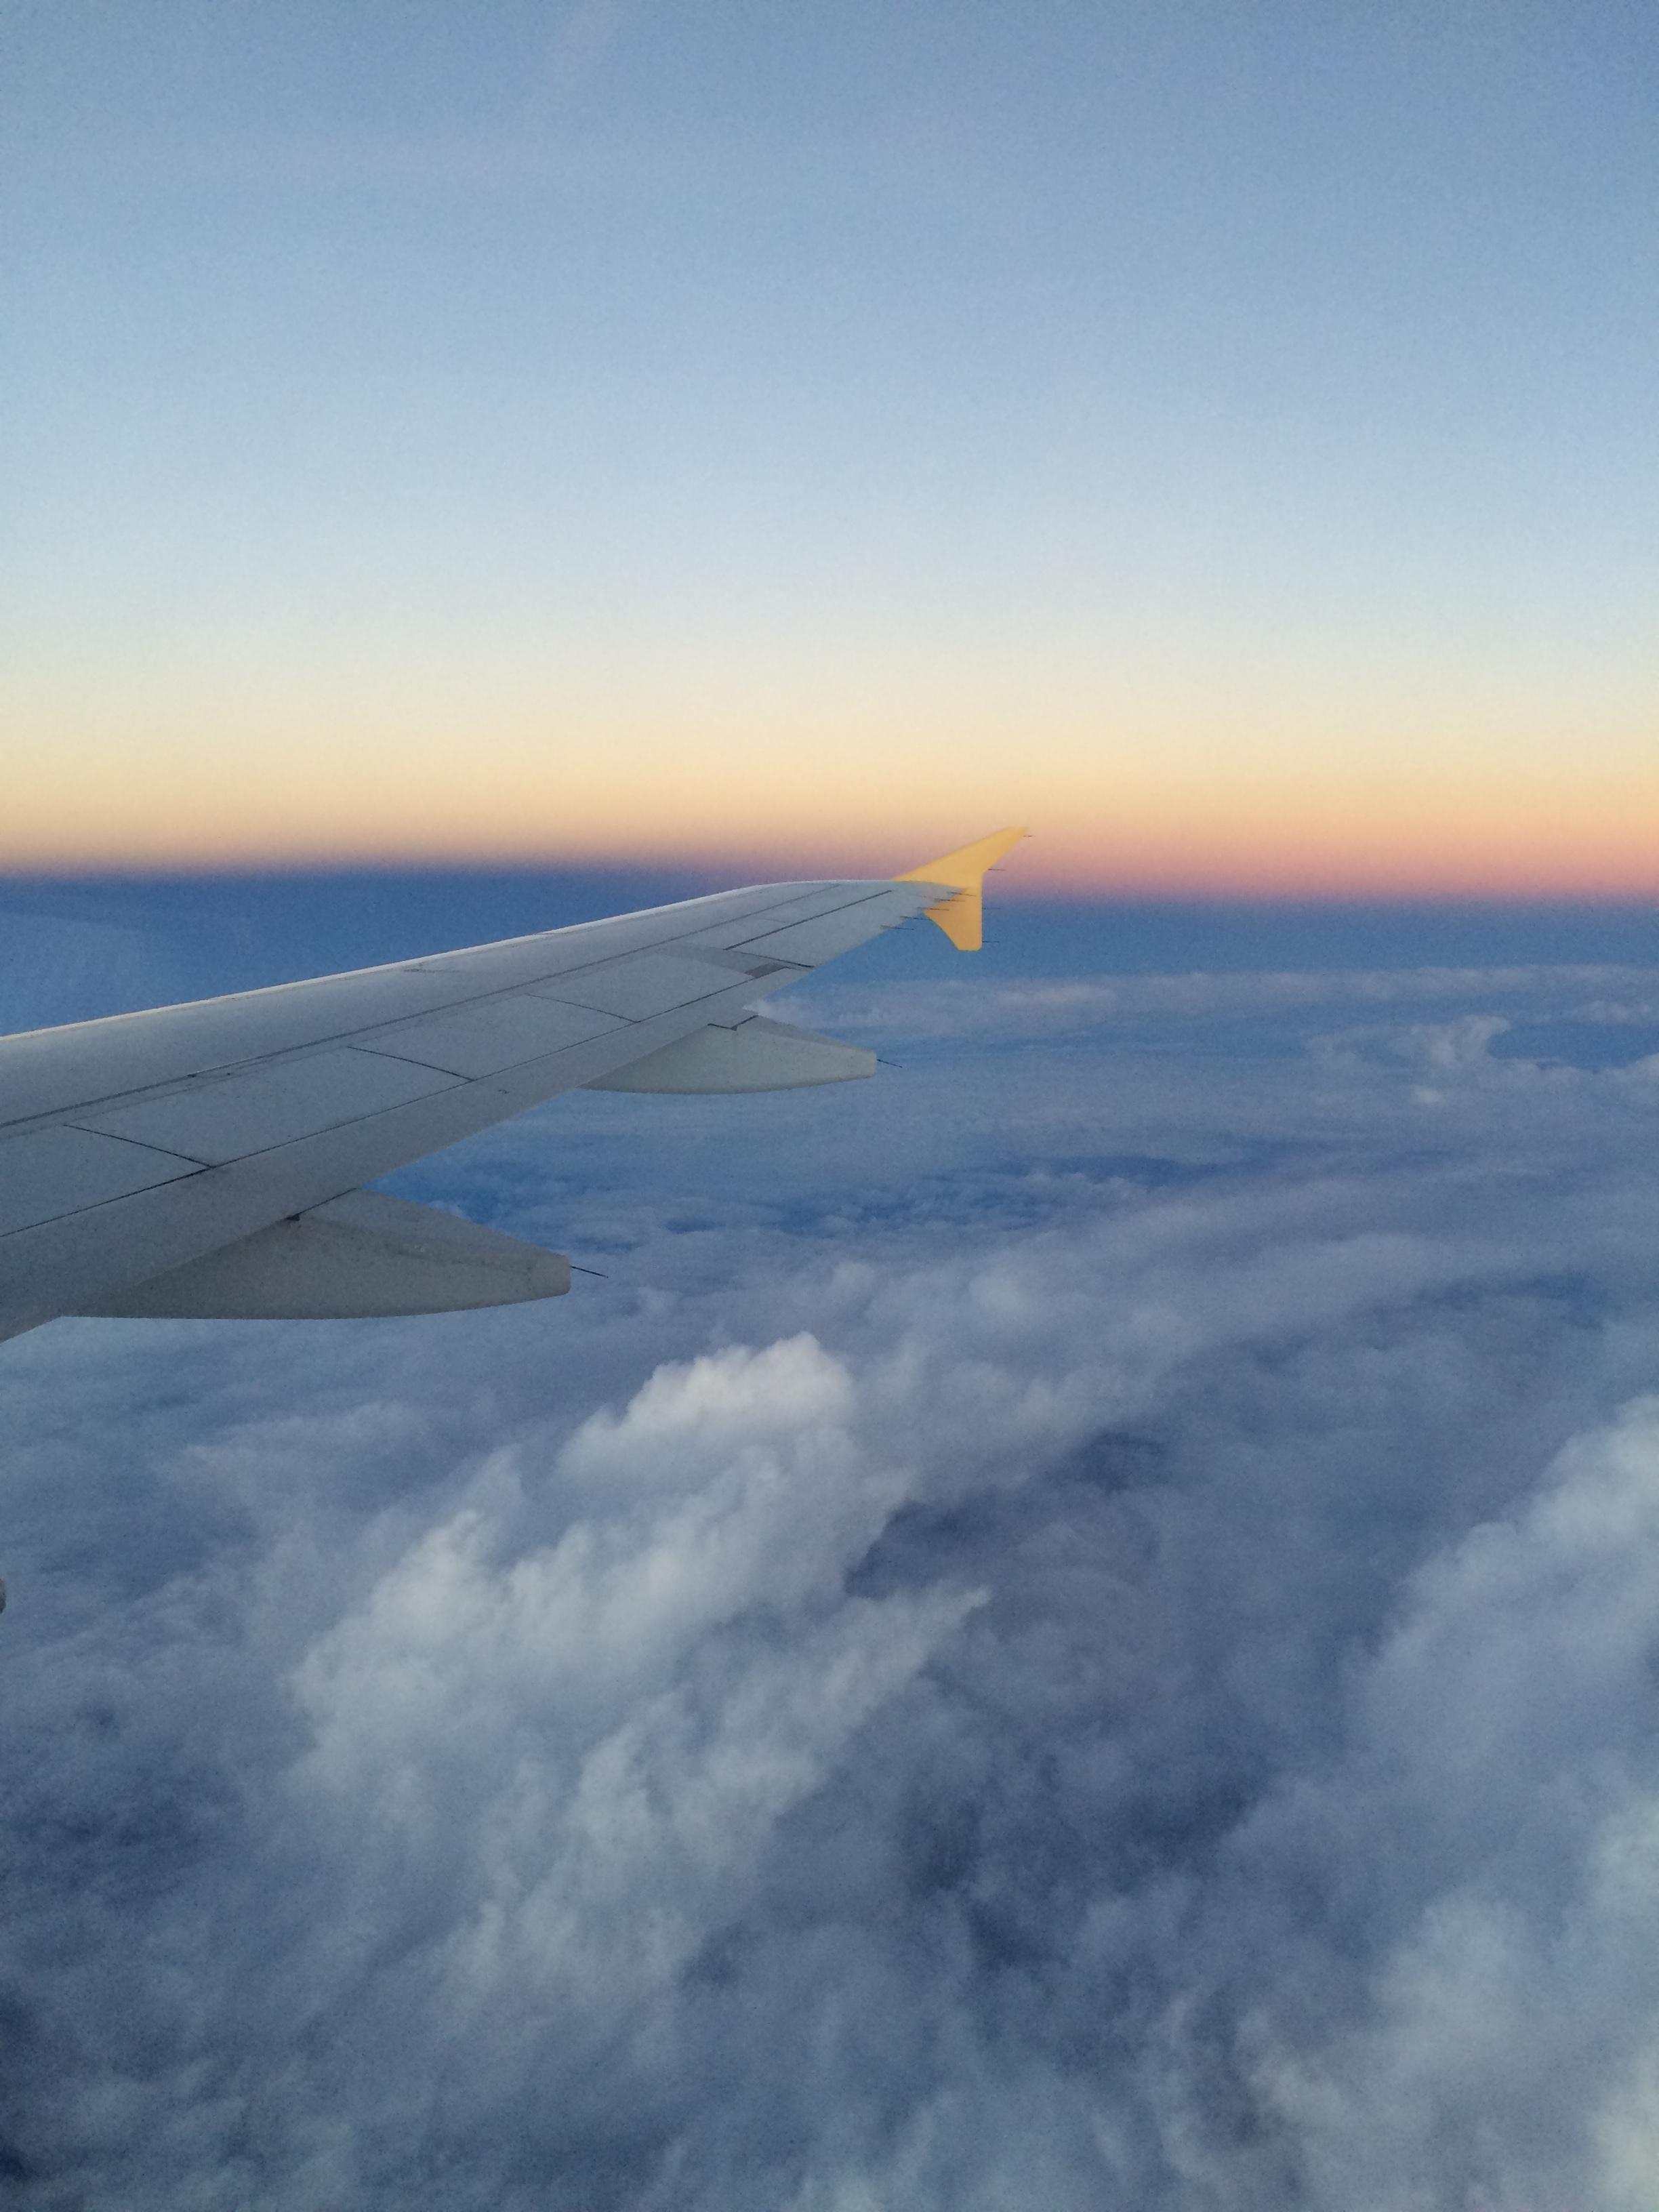 Obligatory plane window shot